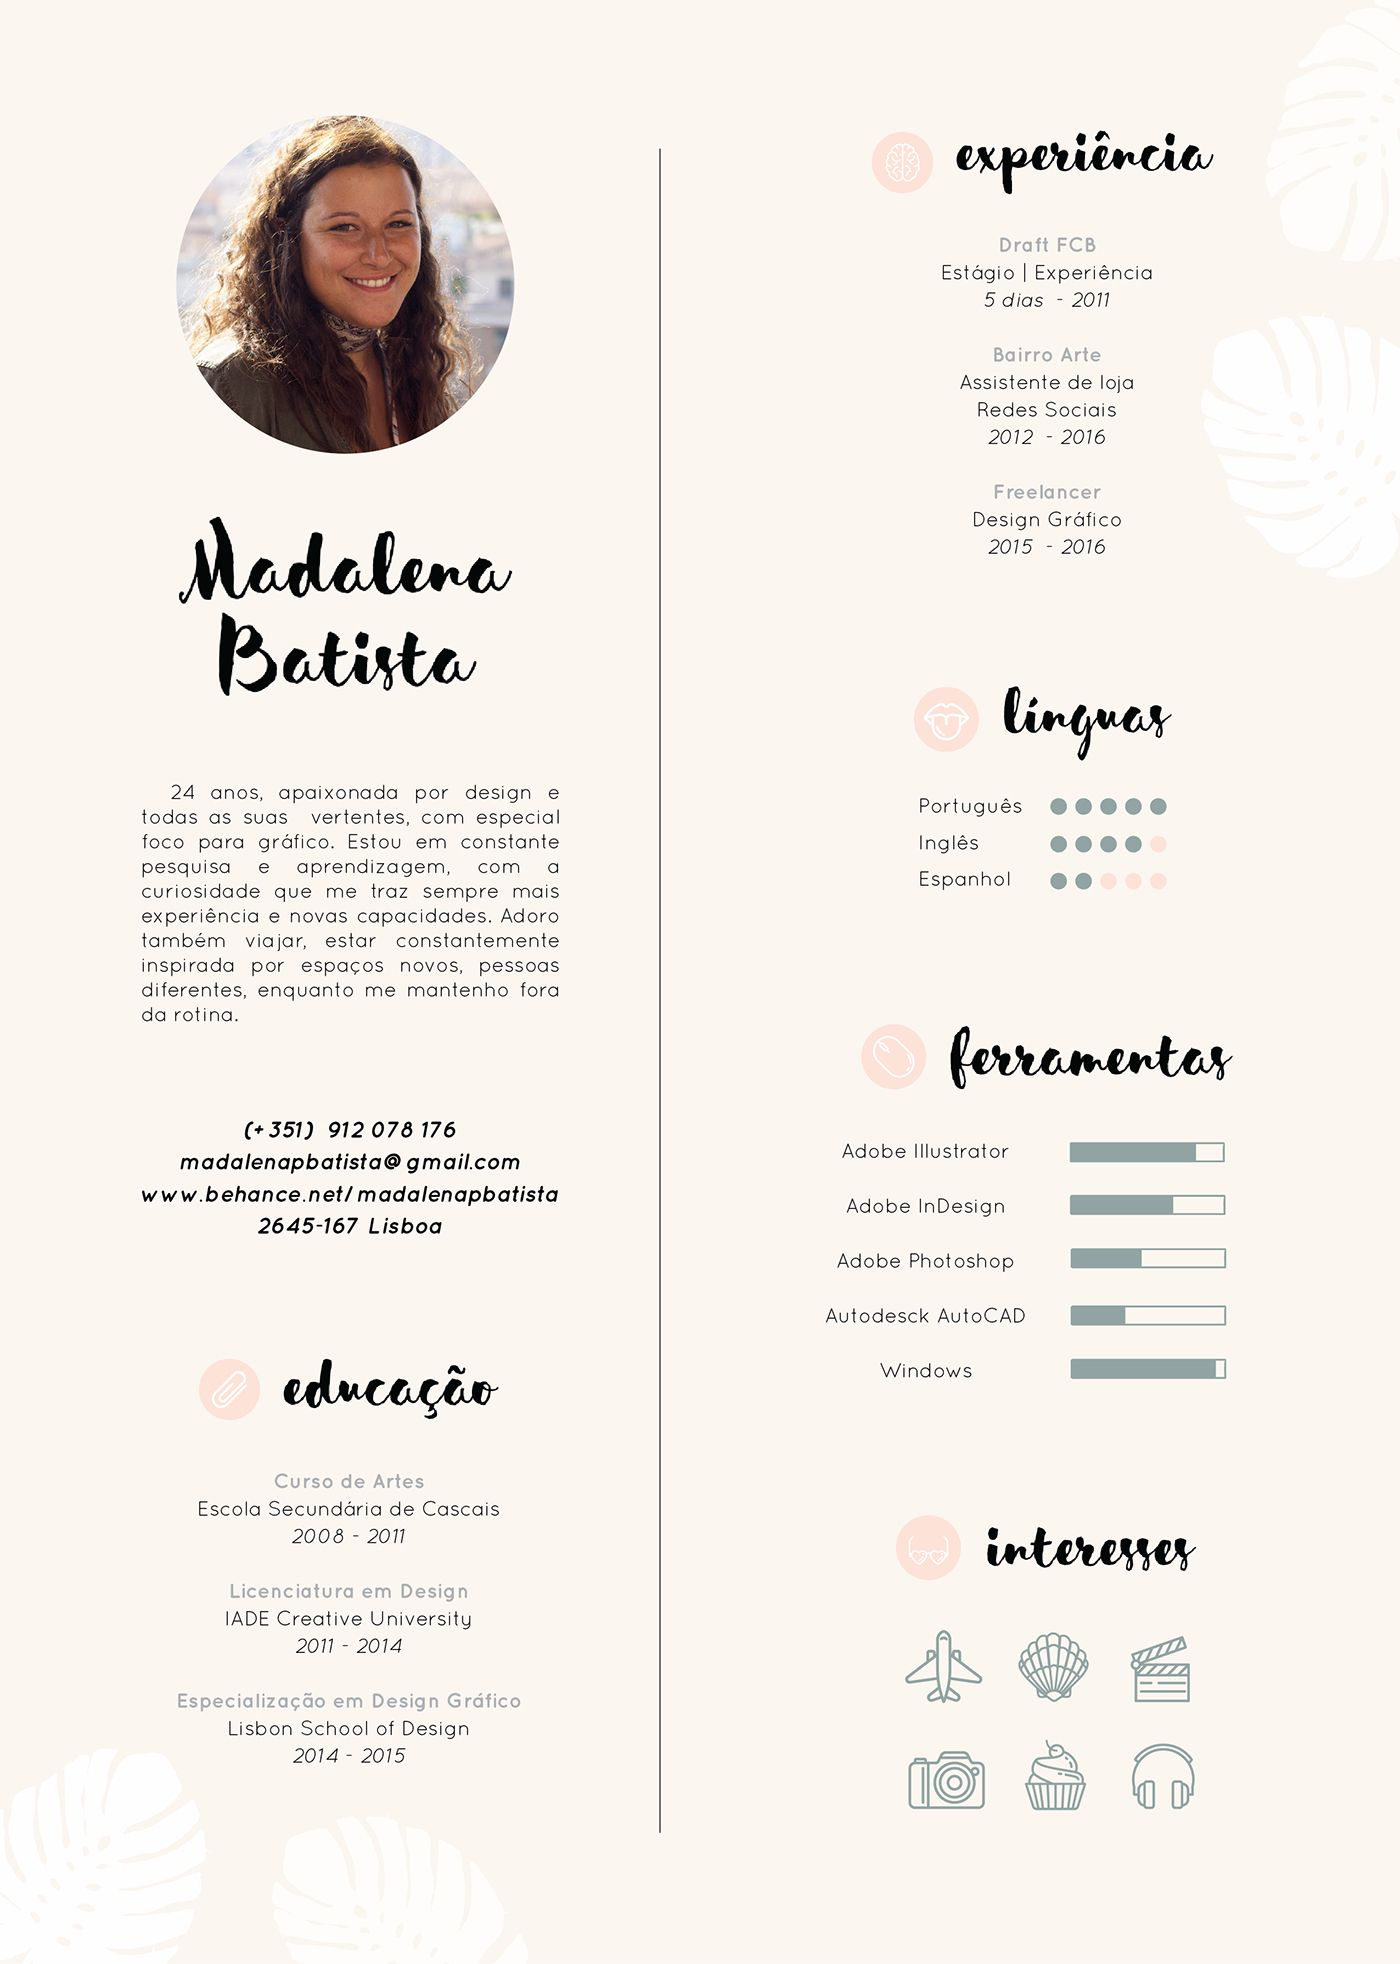 Resume Madalena Batista On Behance Modele De Cv Creatif Cv Creatif Mise En Page